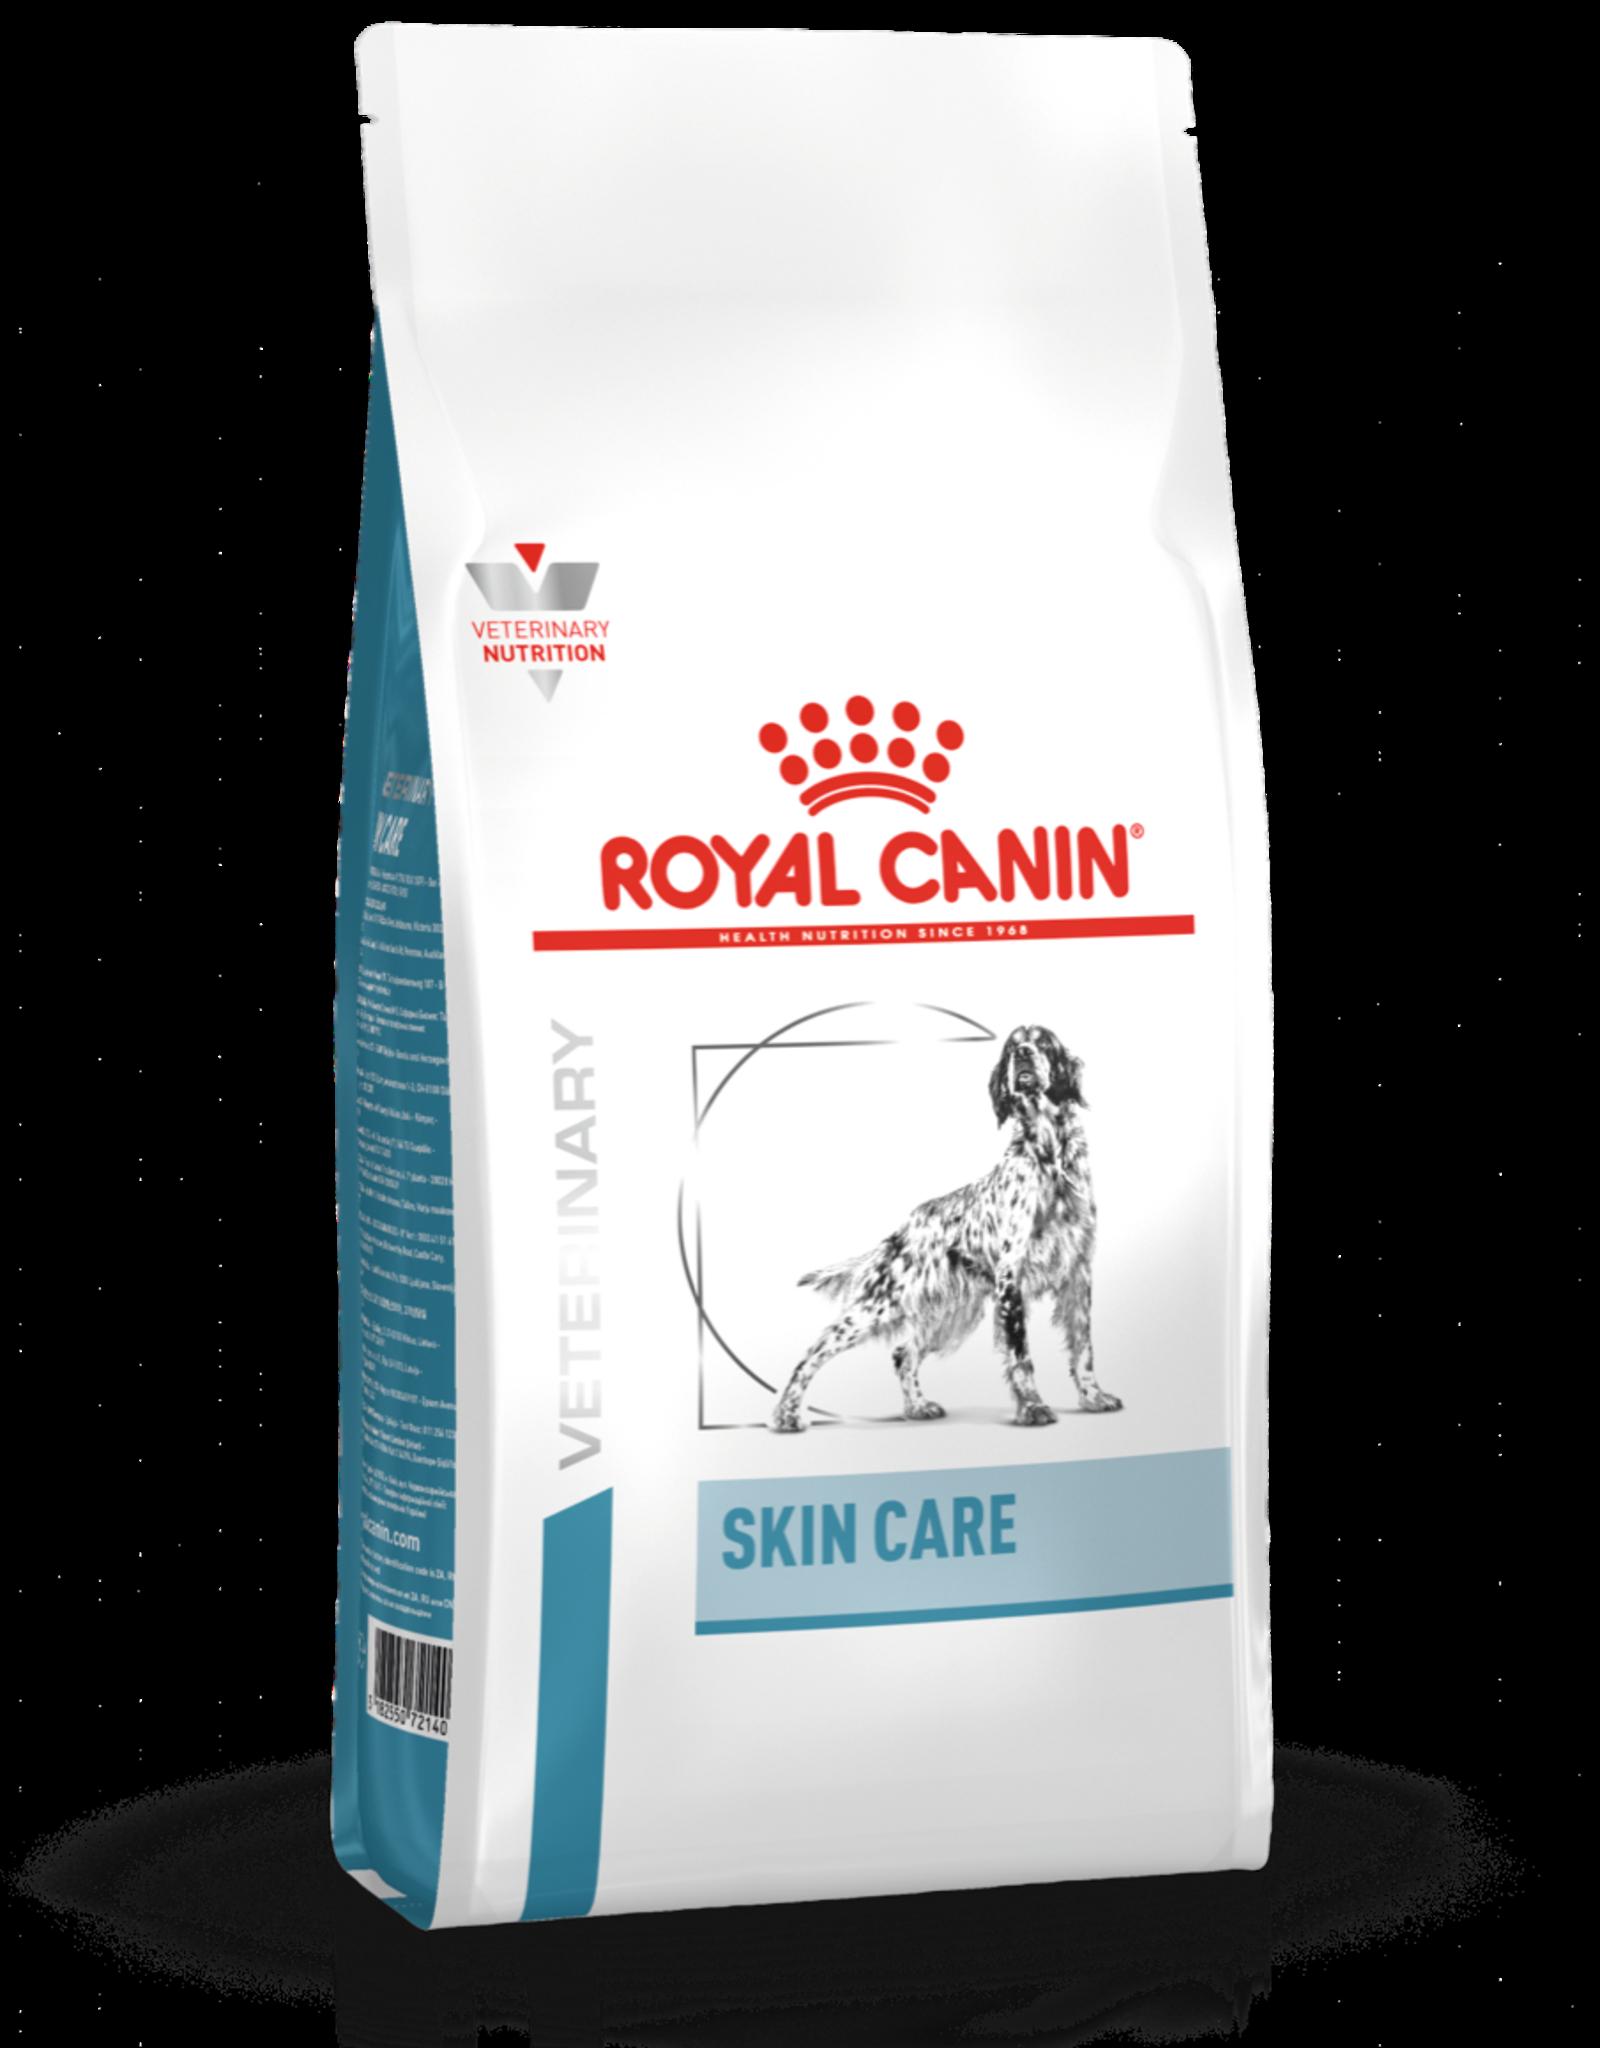 Royal Canin Royal Canin Skin Care Hond 11kg